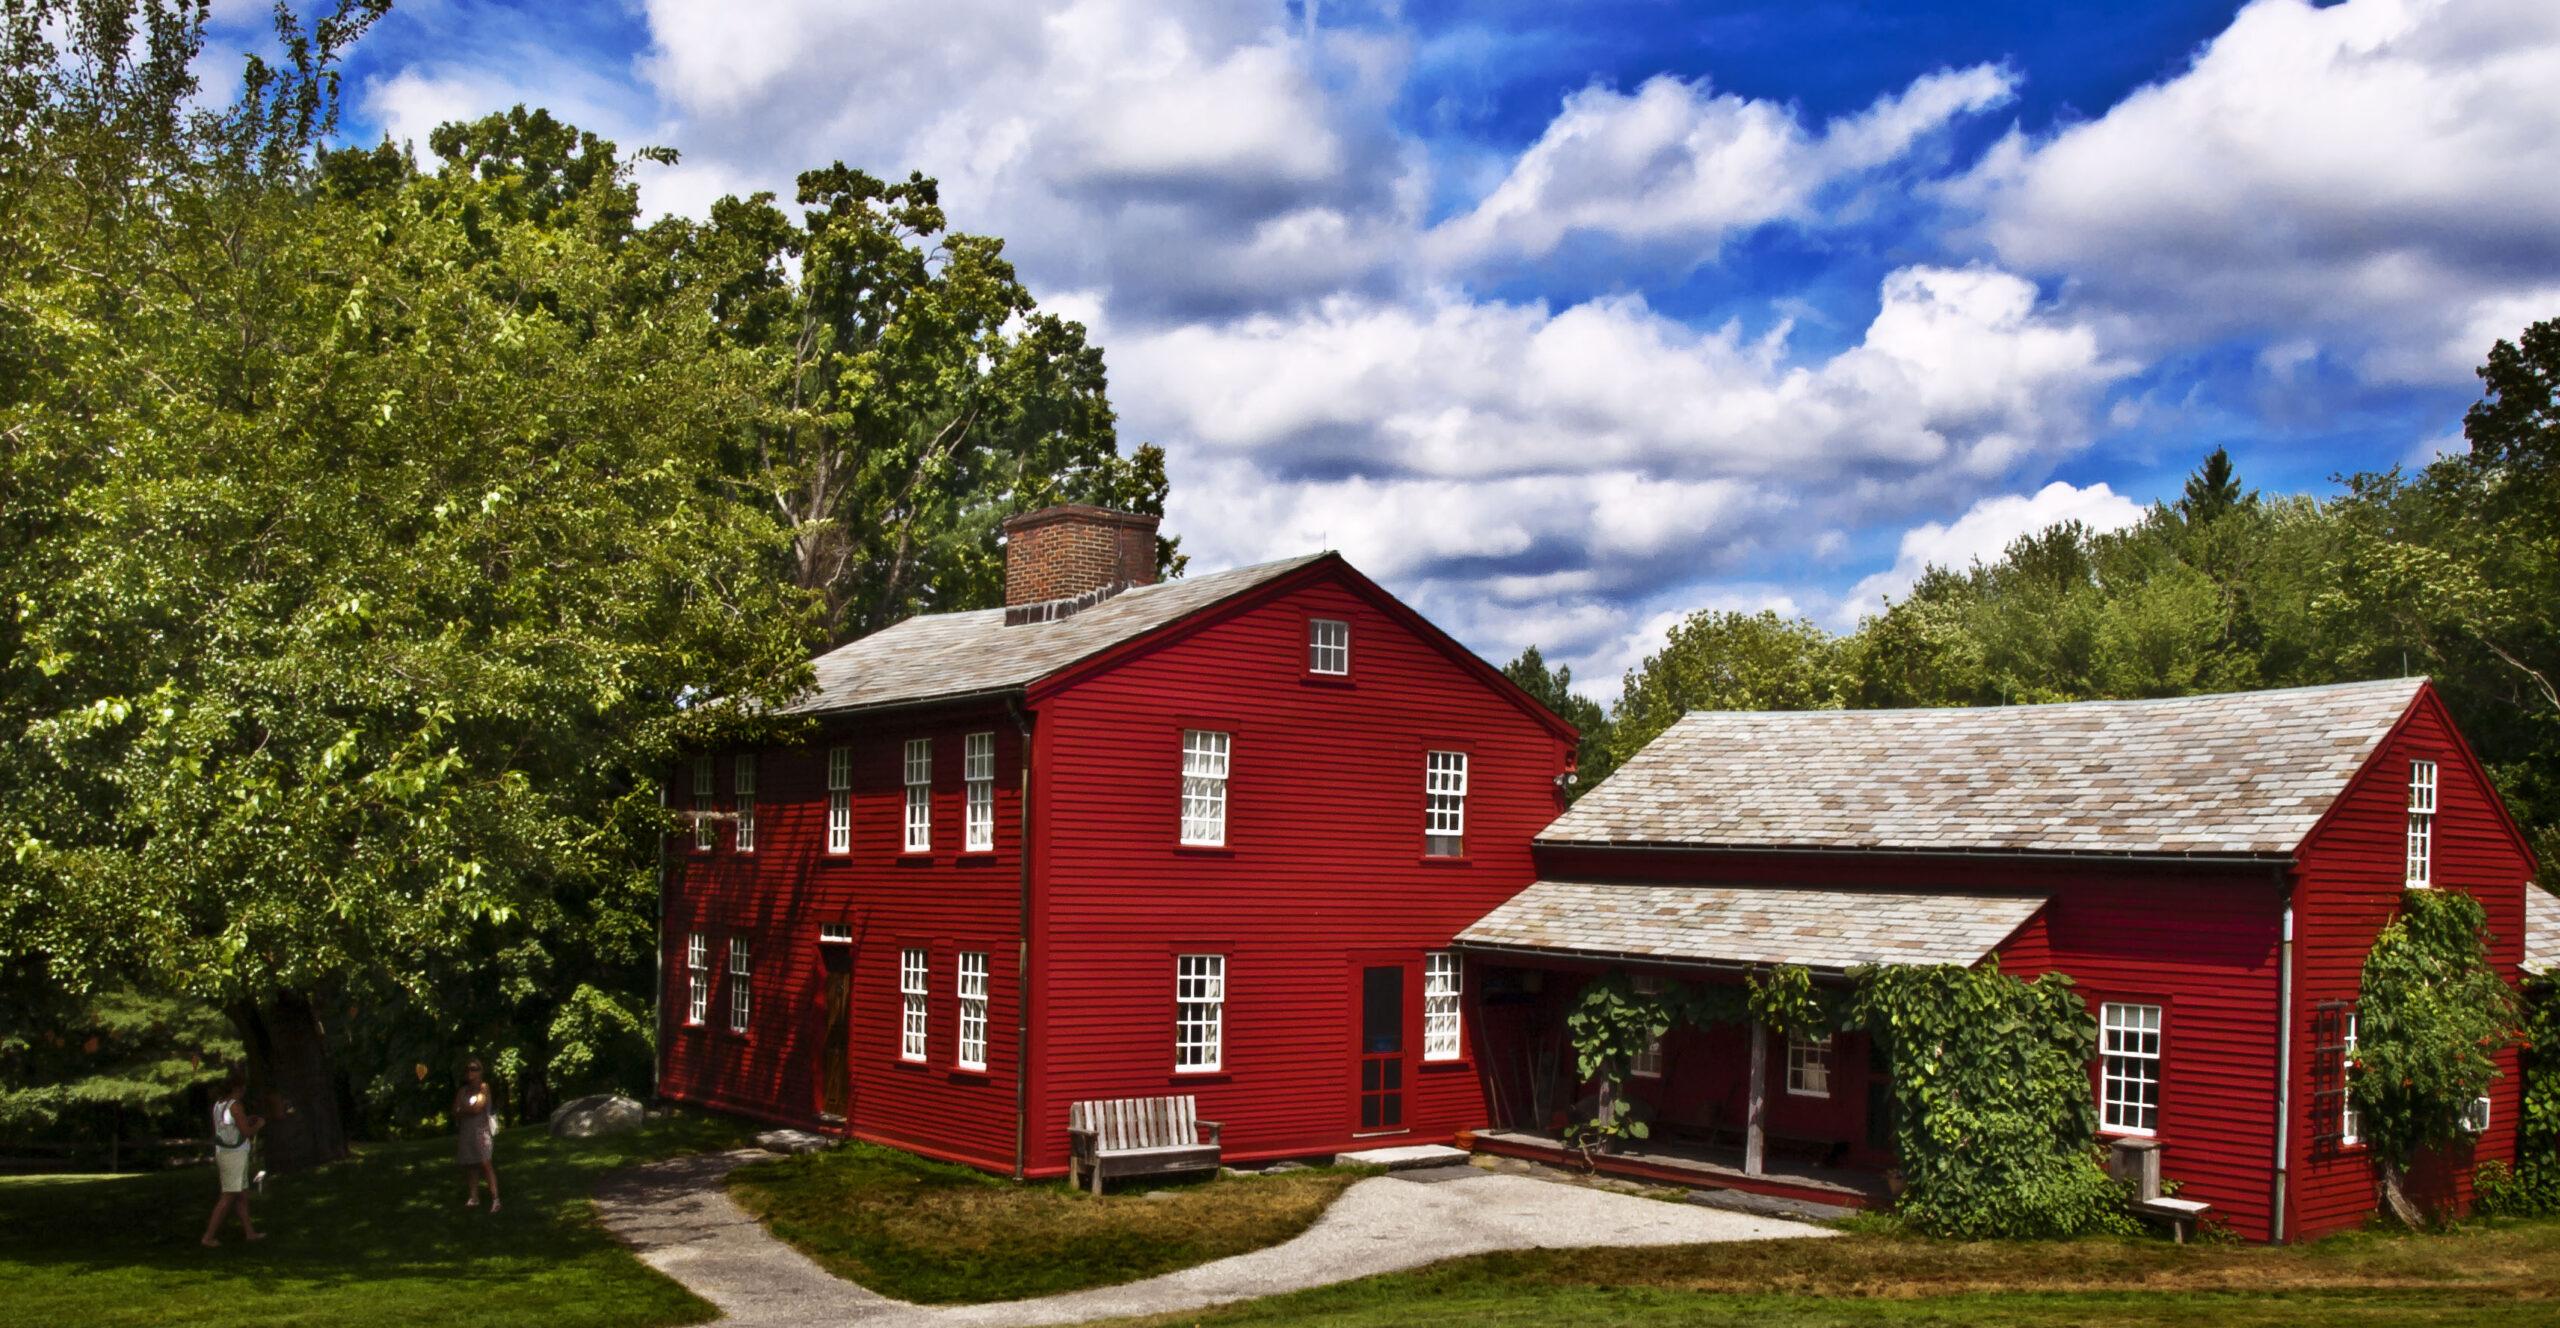 the red Alcott farm house